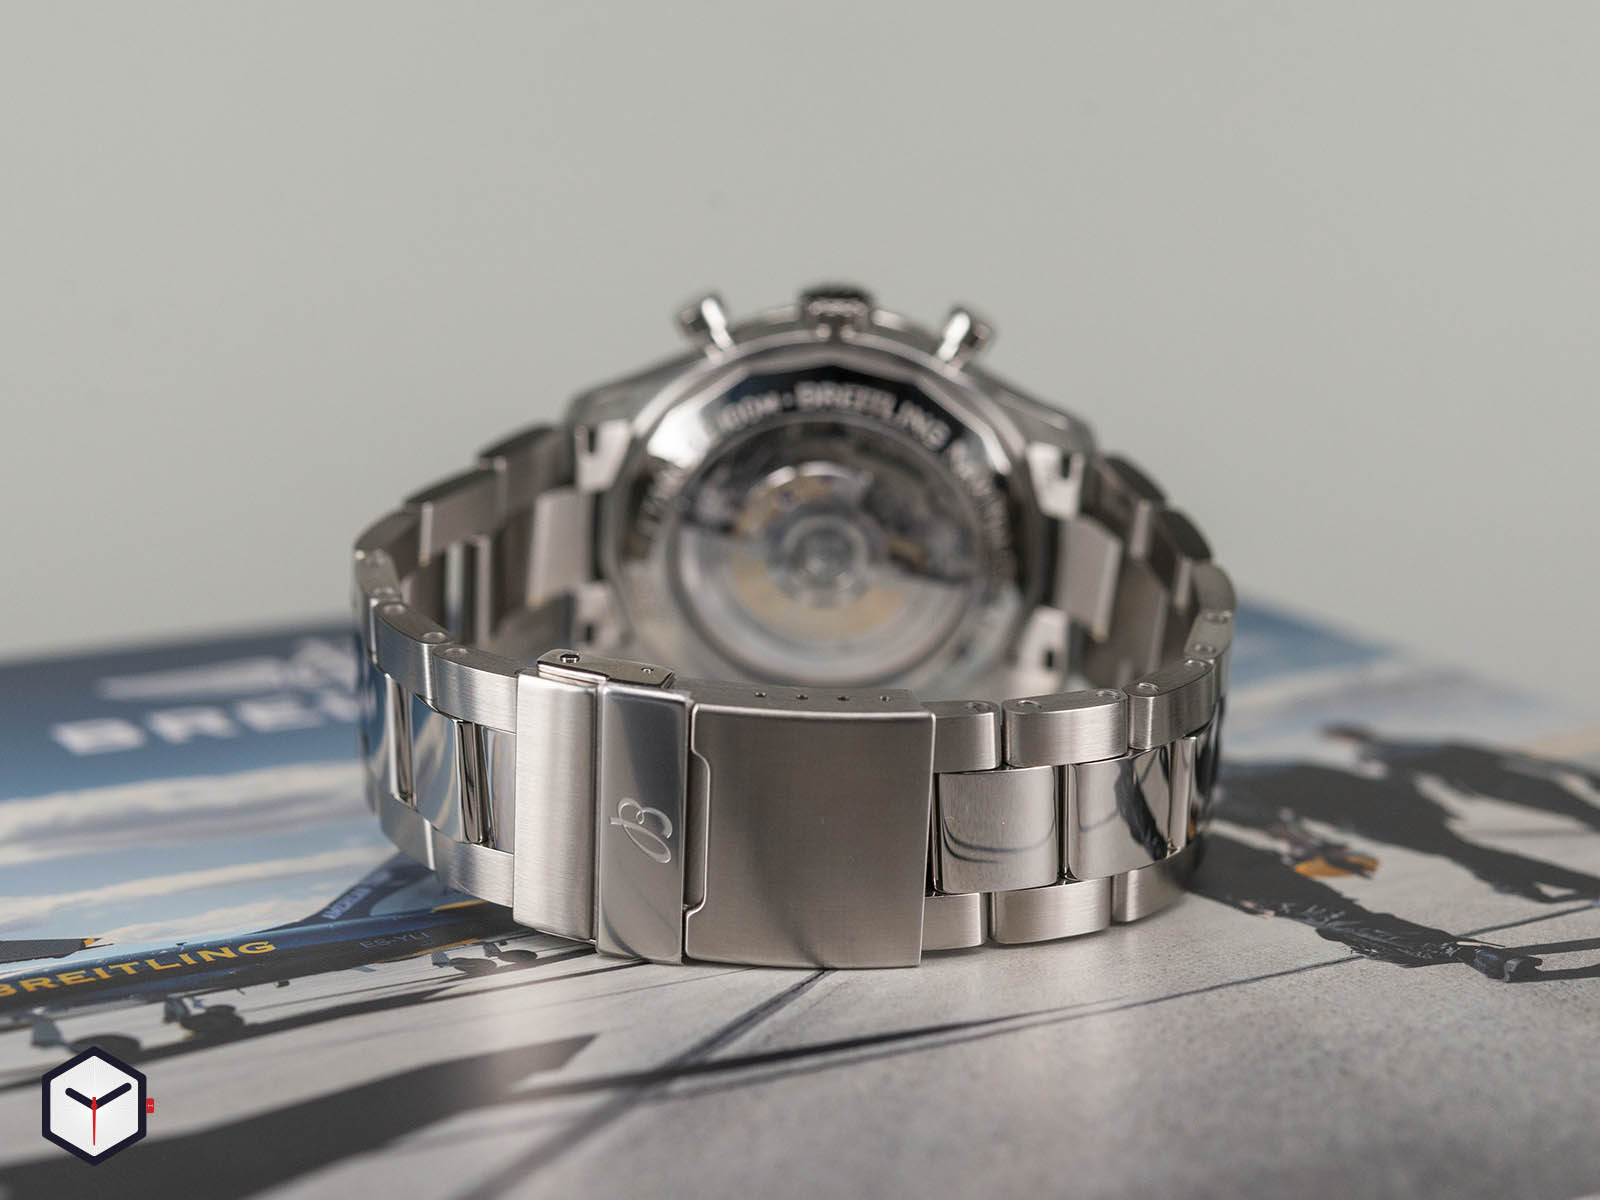 ab0117131b1a1-breitling-navitimer-8-b01-chronograph-7.jpg